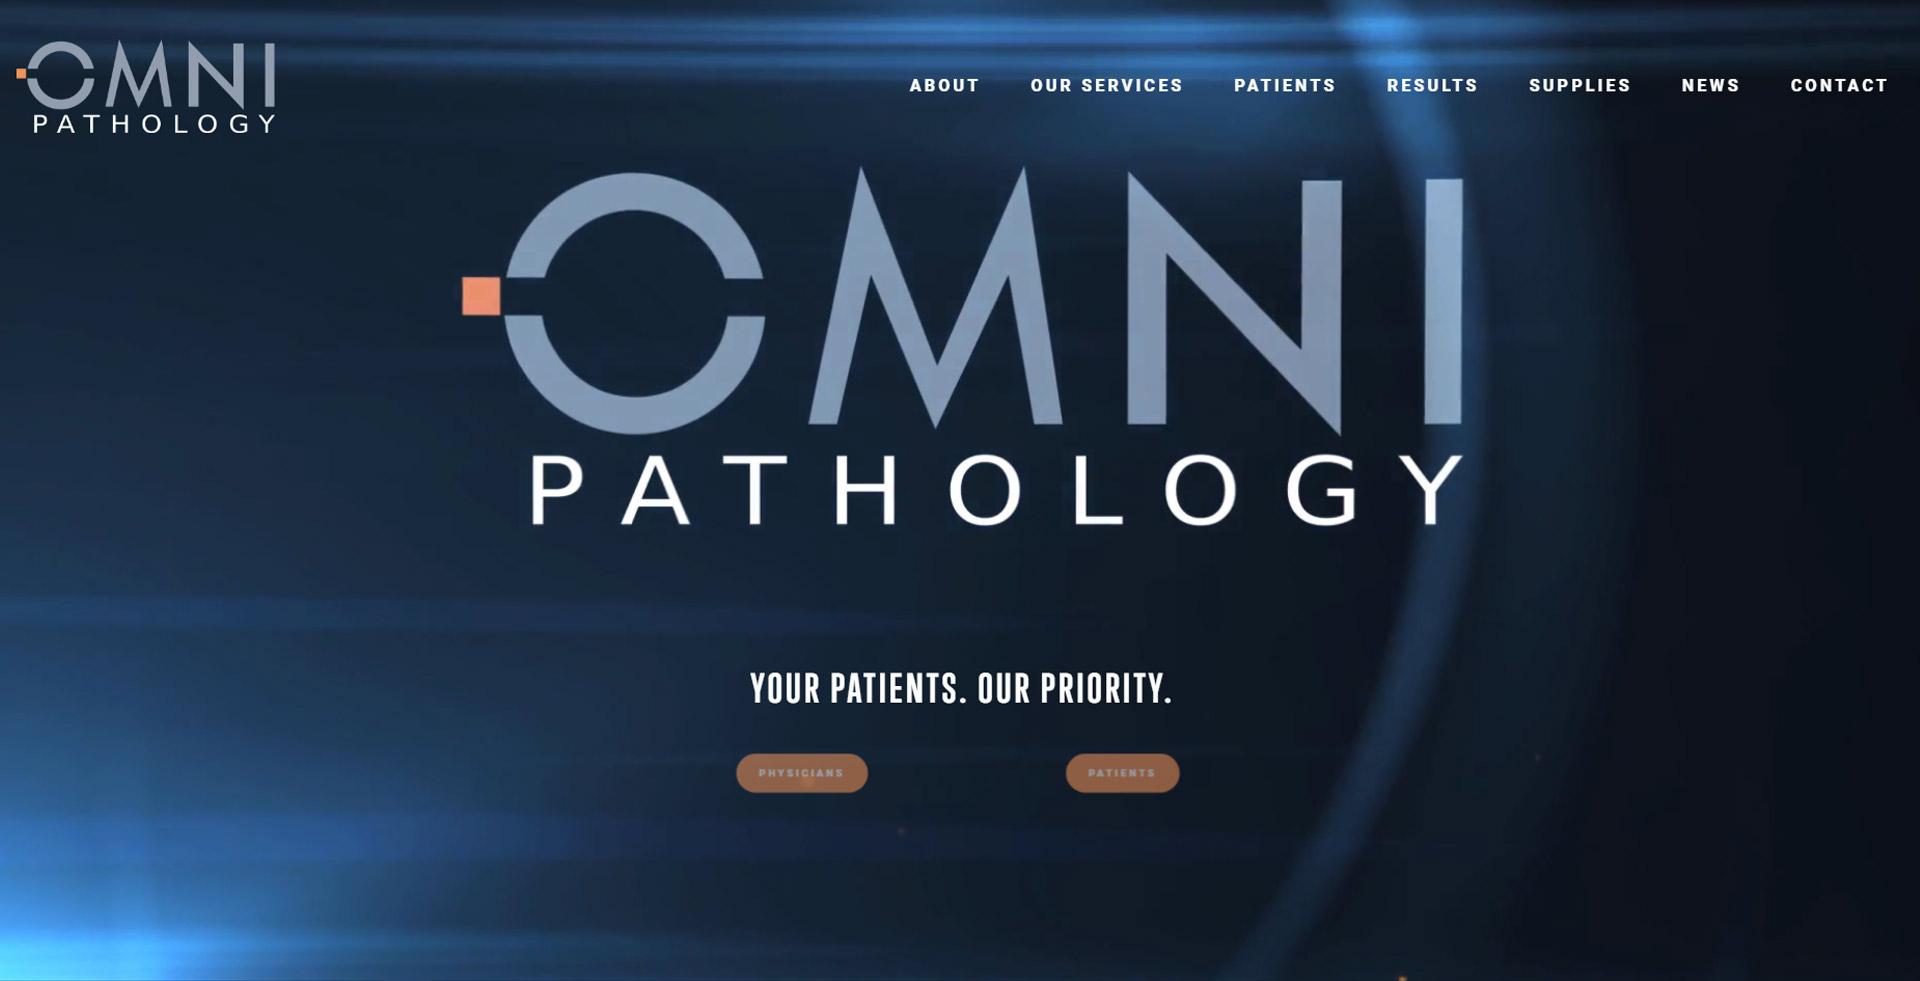 OmniPathology-NewSite.jpg